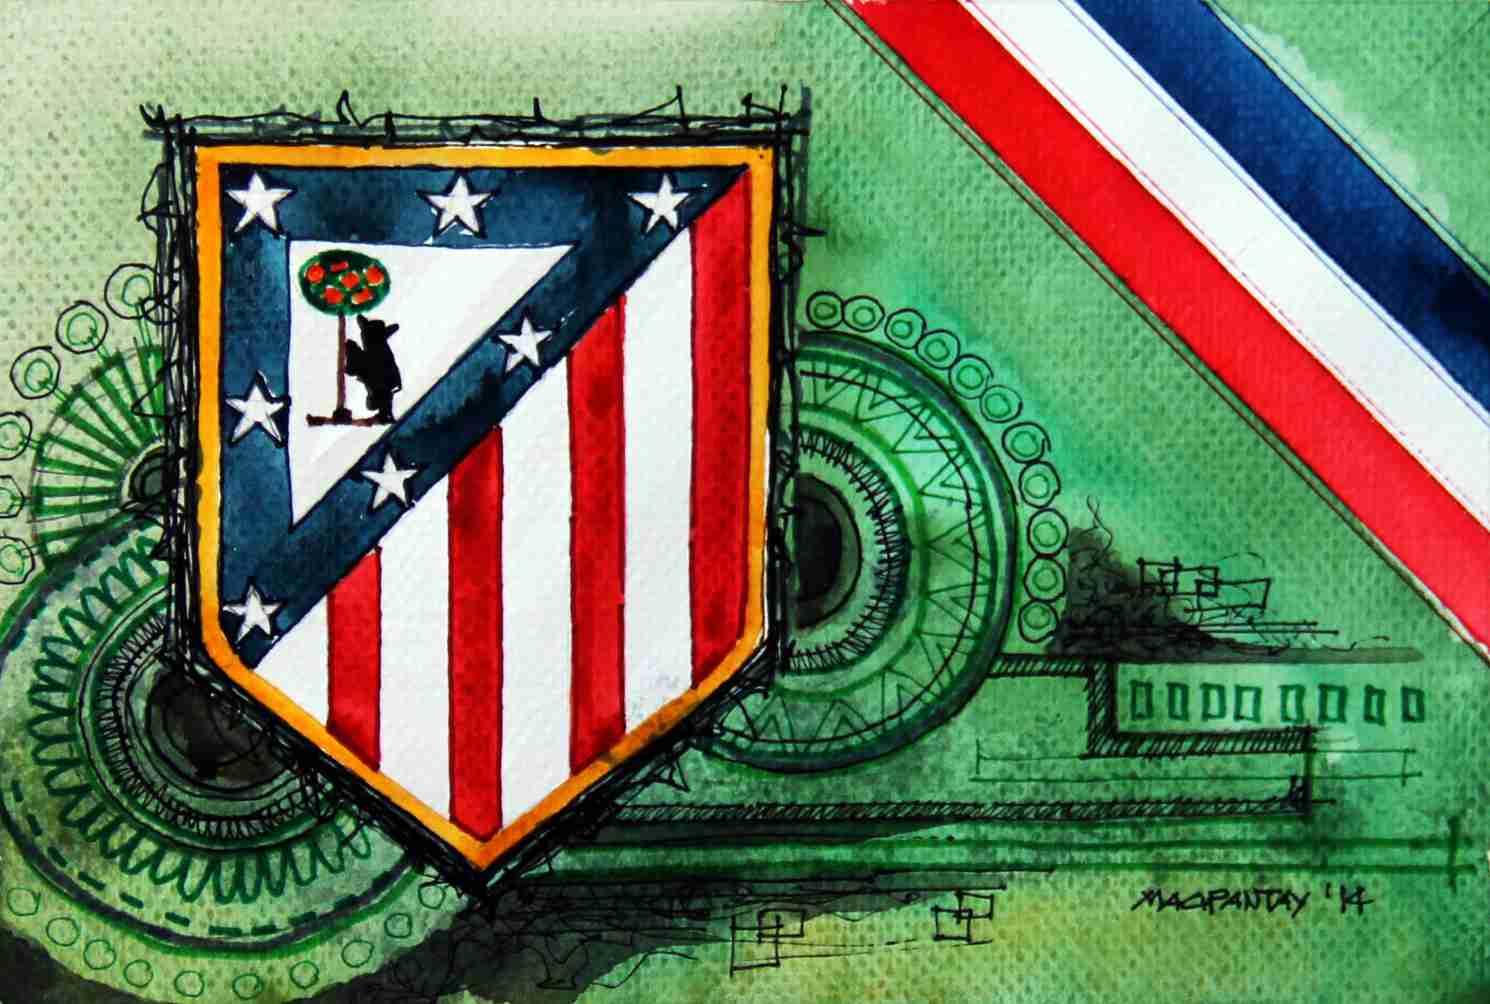 _Atletico Madrid - Wappen mit Farben